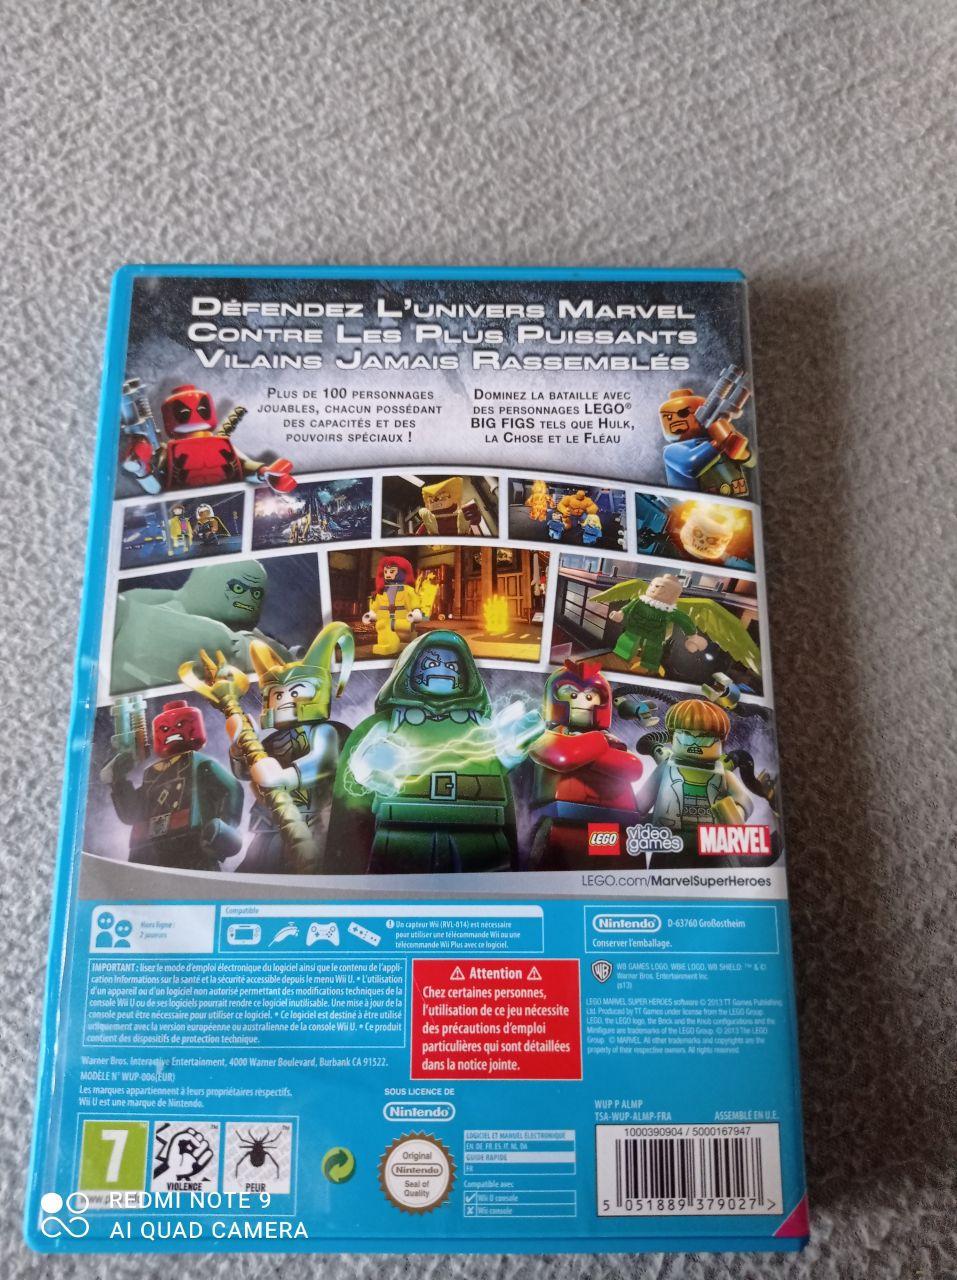 Image article Nintendo - Wii U - Lego Marvel super heroes